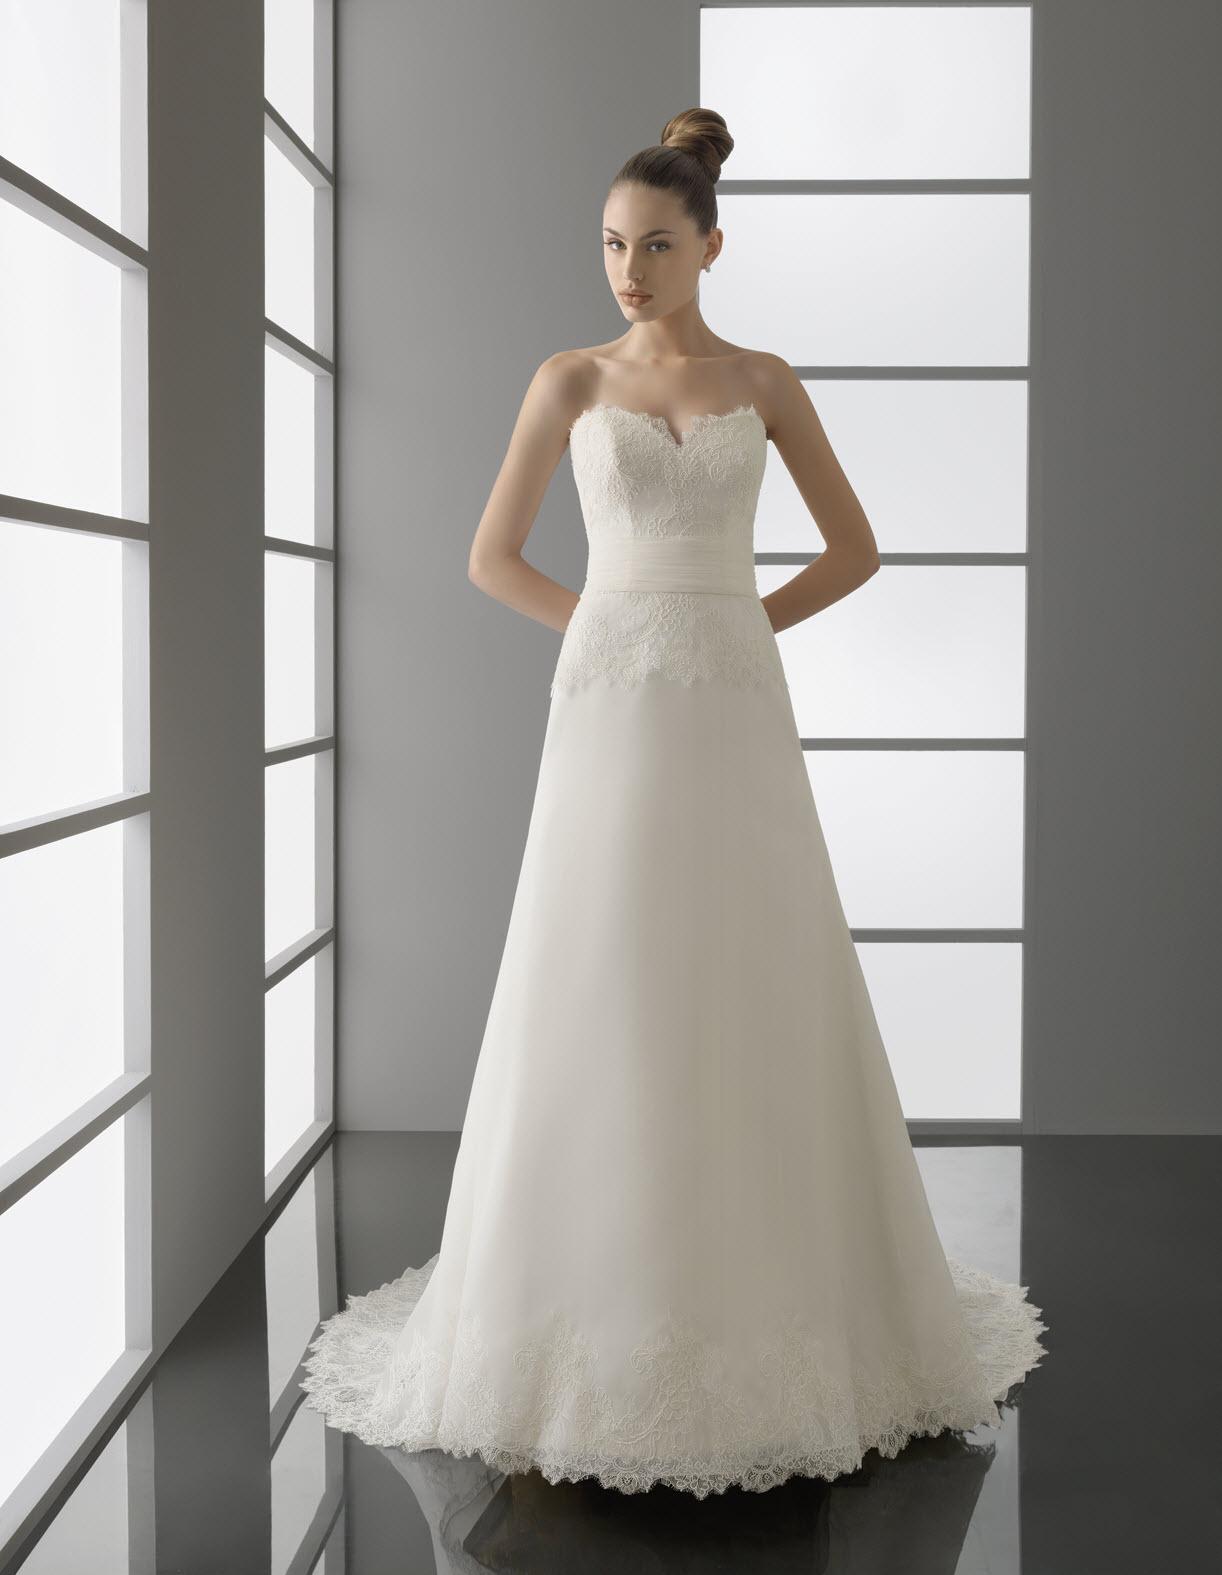 Wedding Dresses Modified A Line : Romantic ivory lace strapless modified a line wedding dress with